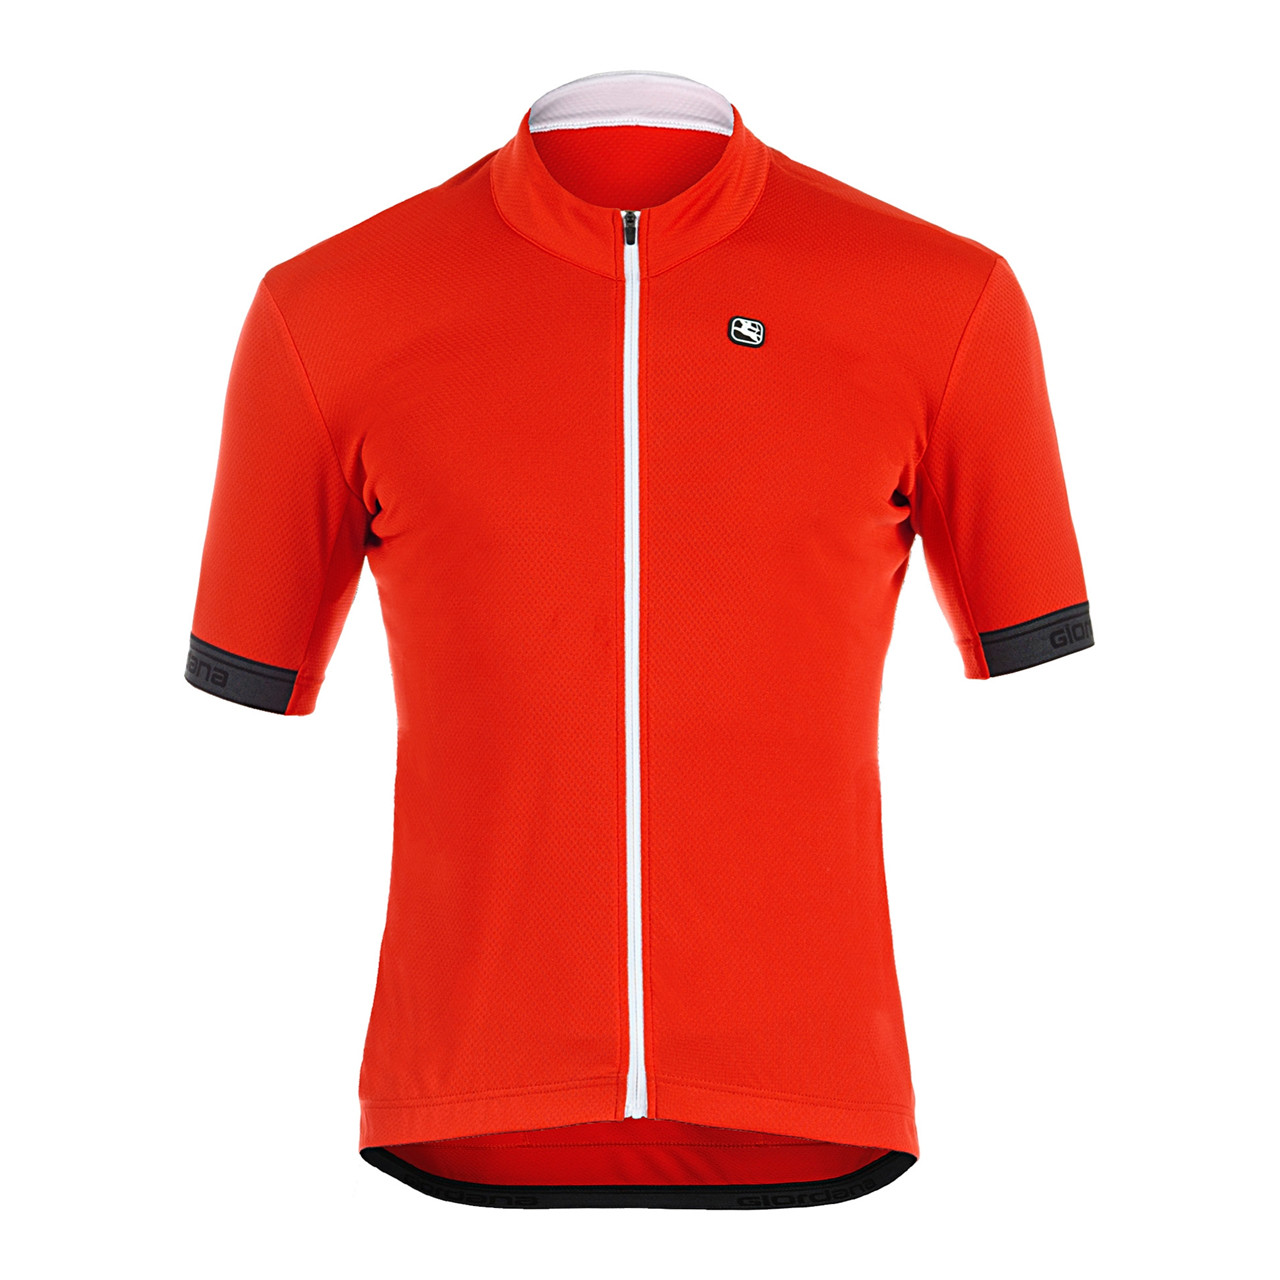 Giordana Jersey Fusion Kortærmet (Rød, L) Cykel Tilbehør      Cykeltøj  Giordana Cykeltøj  Cykelbeklædning